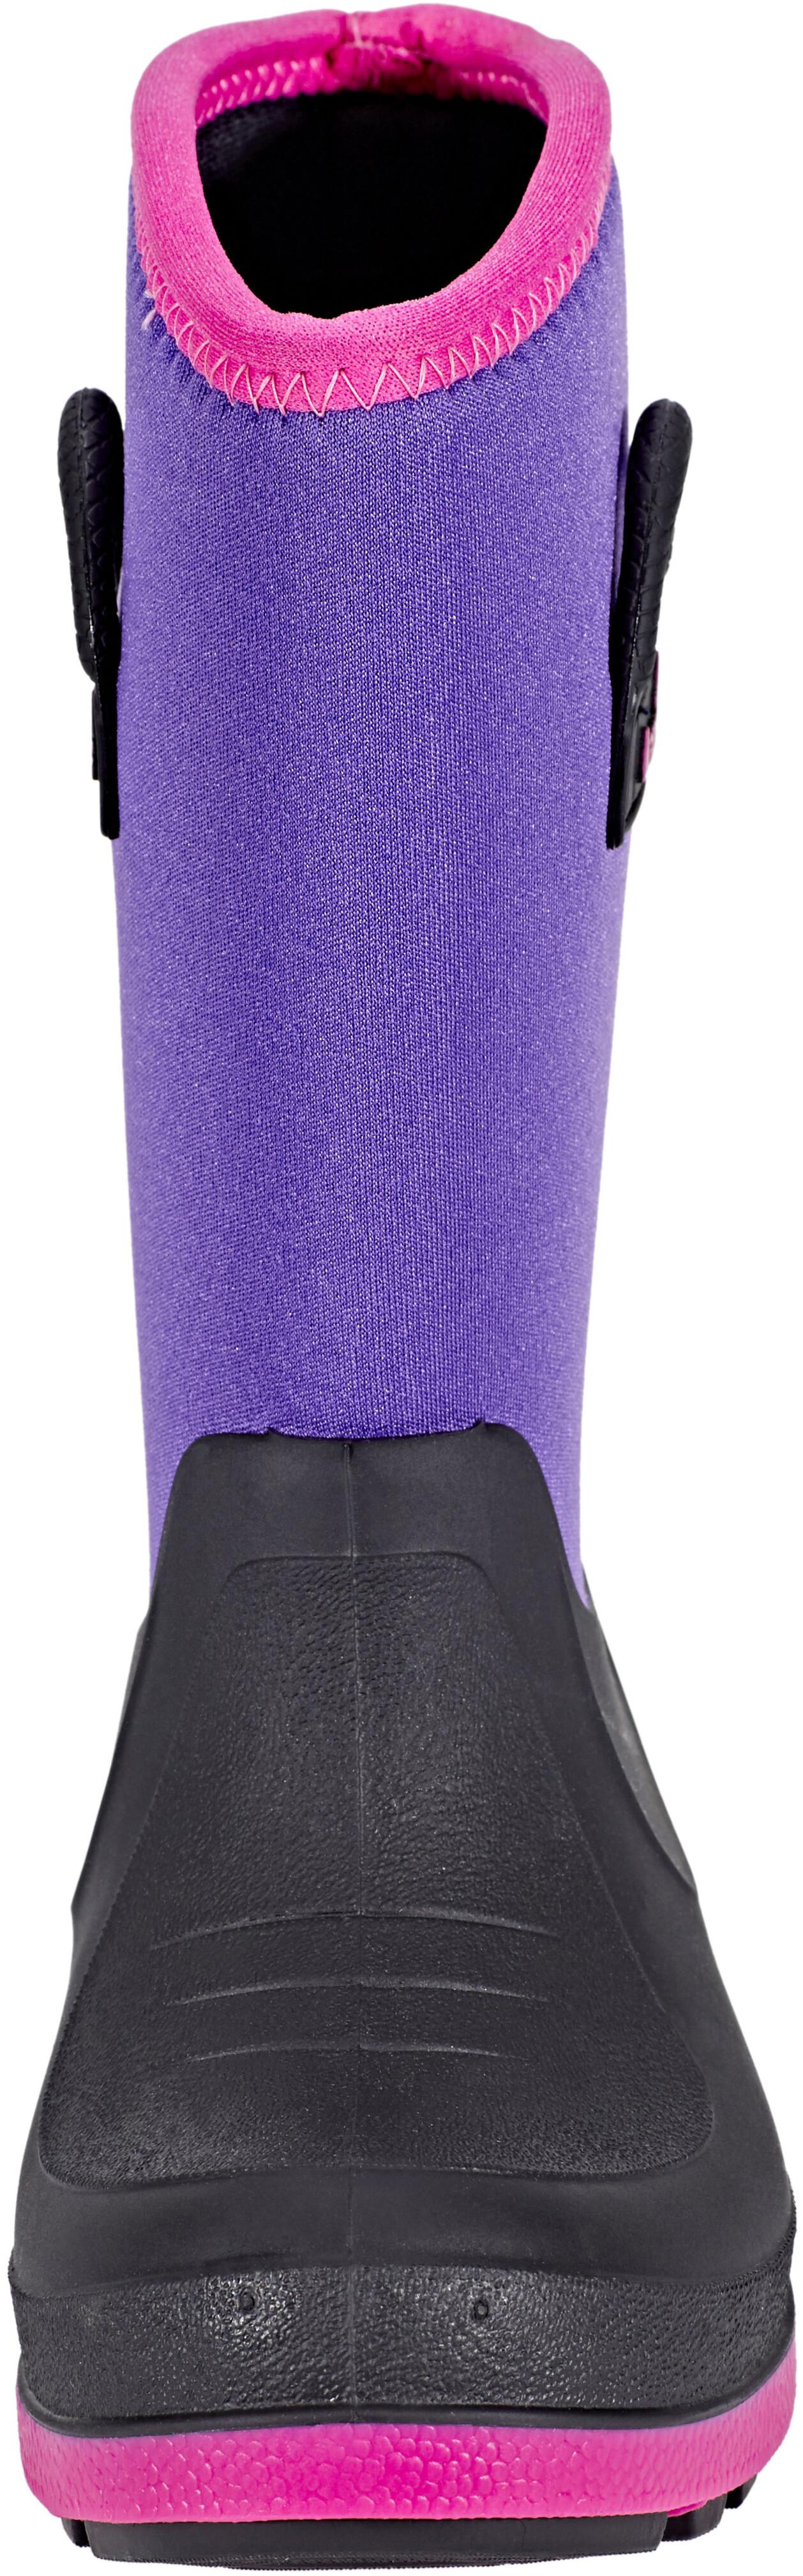 Kamik Bluster Rubber Boots Kinder purple | campz.at